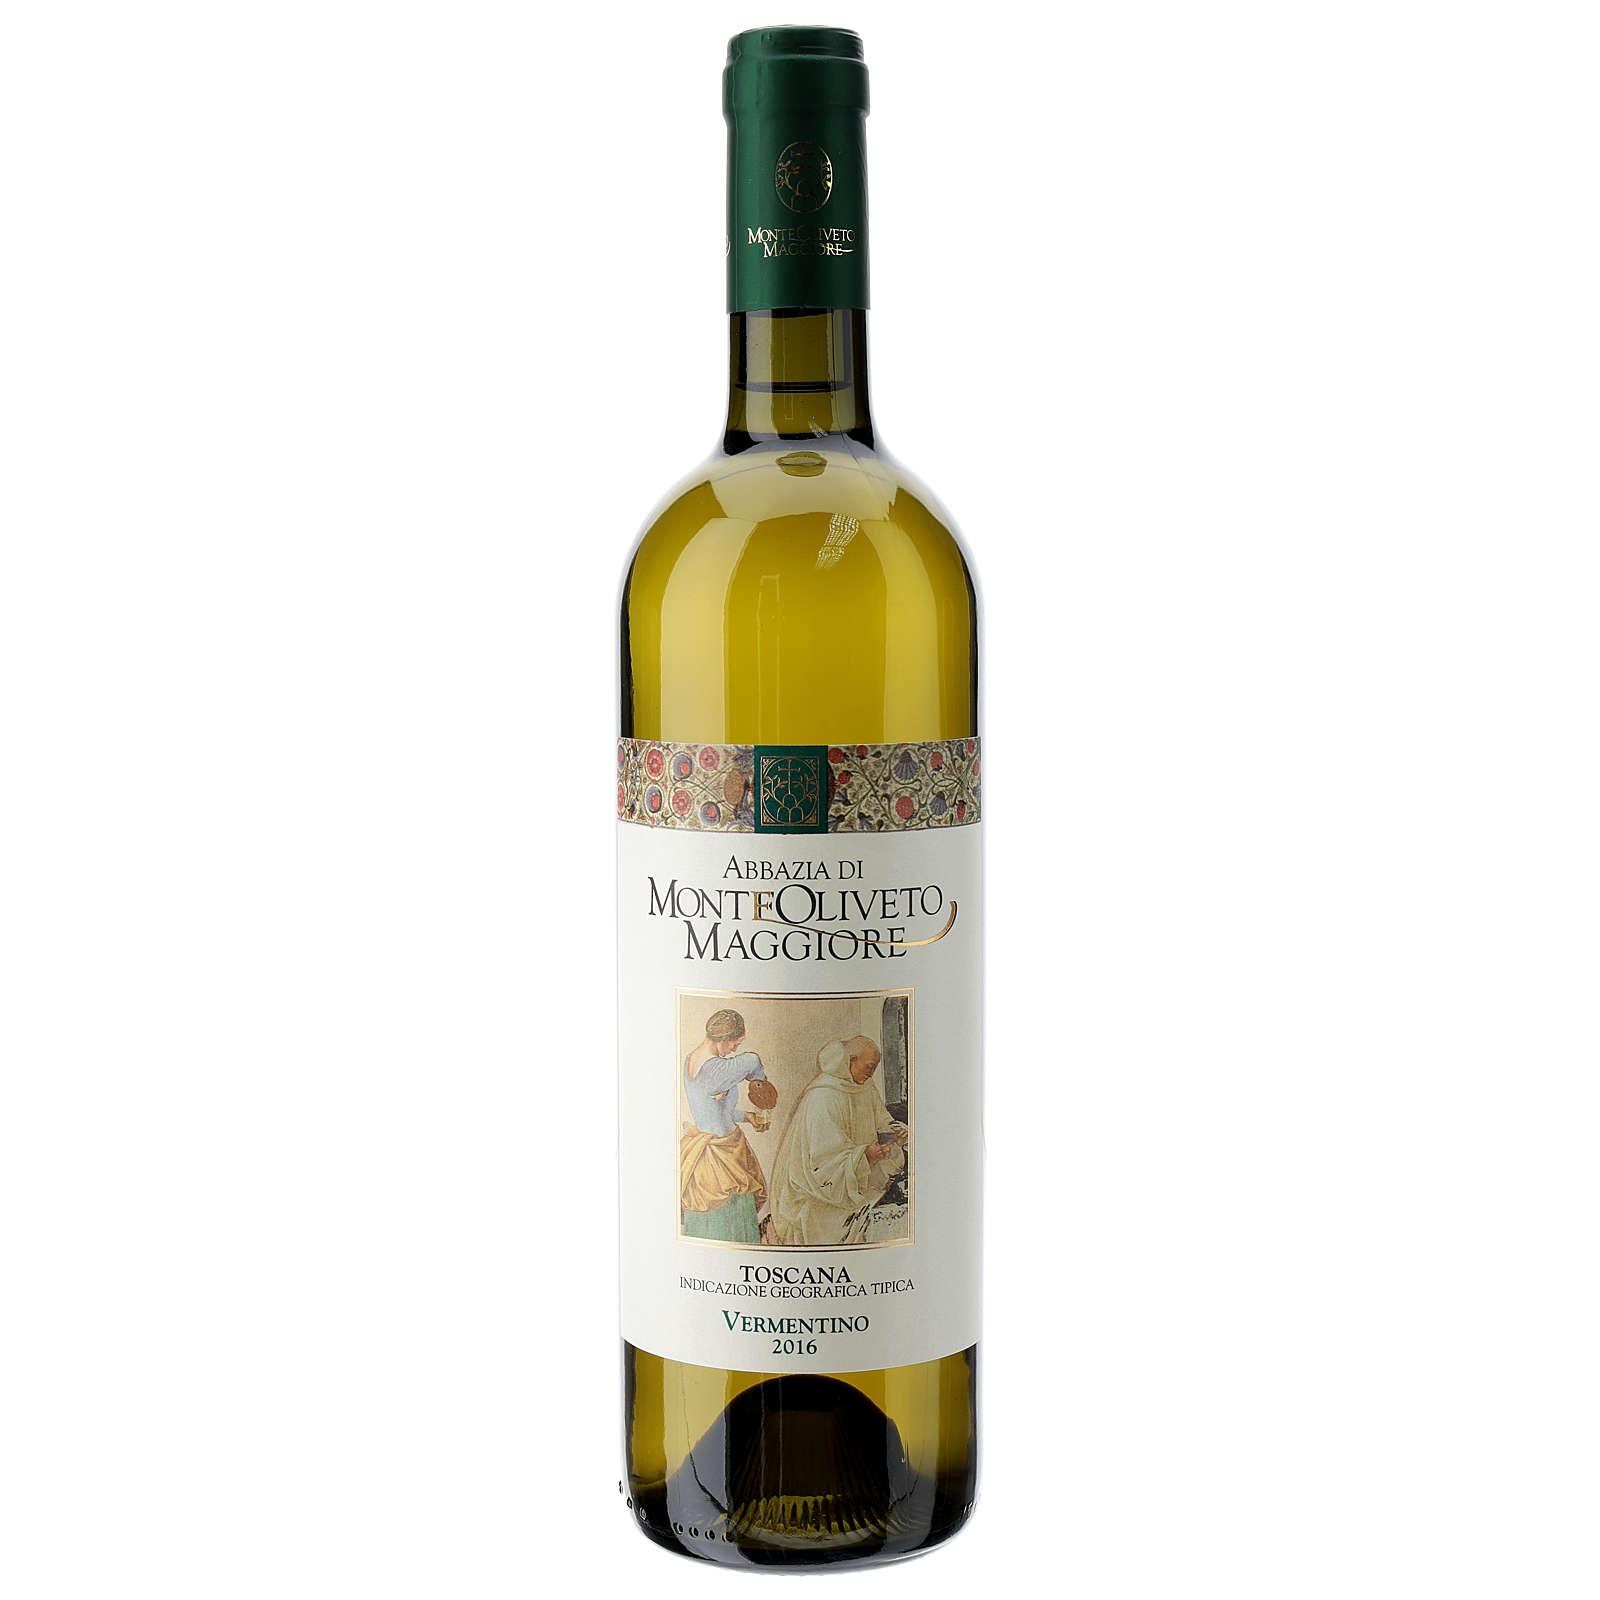 Vinho Toscano Branco 2016 Abadia Monte Oliveto 750 ml 3